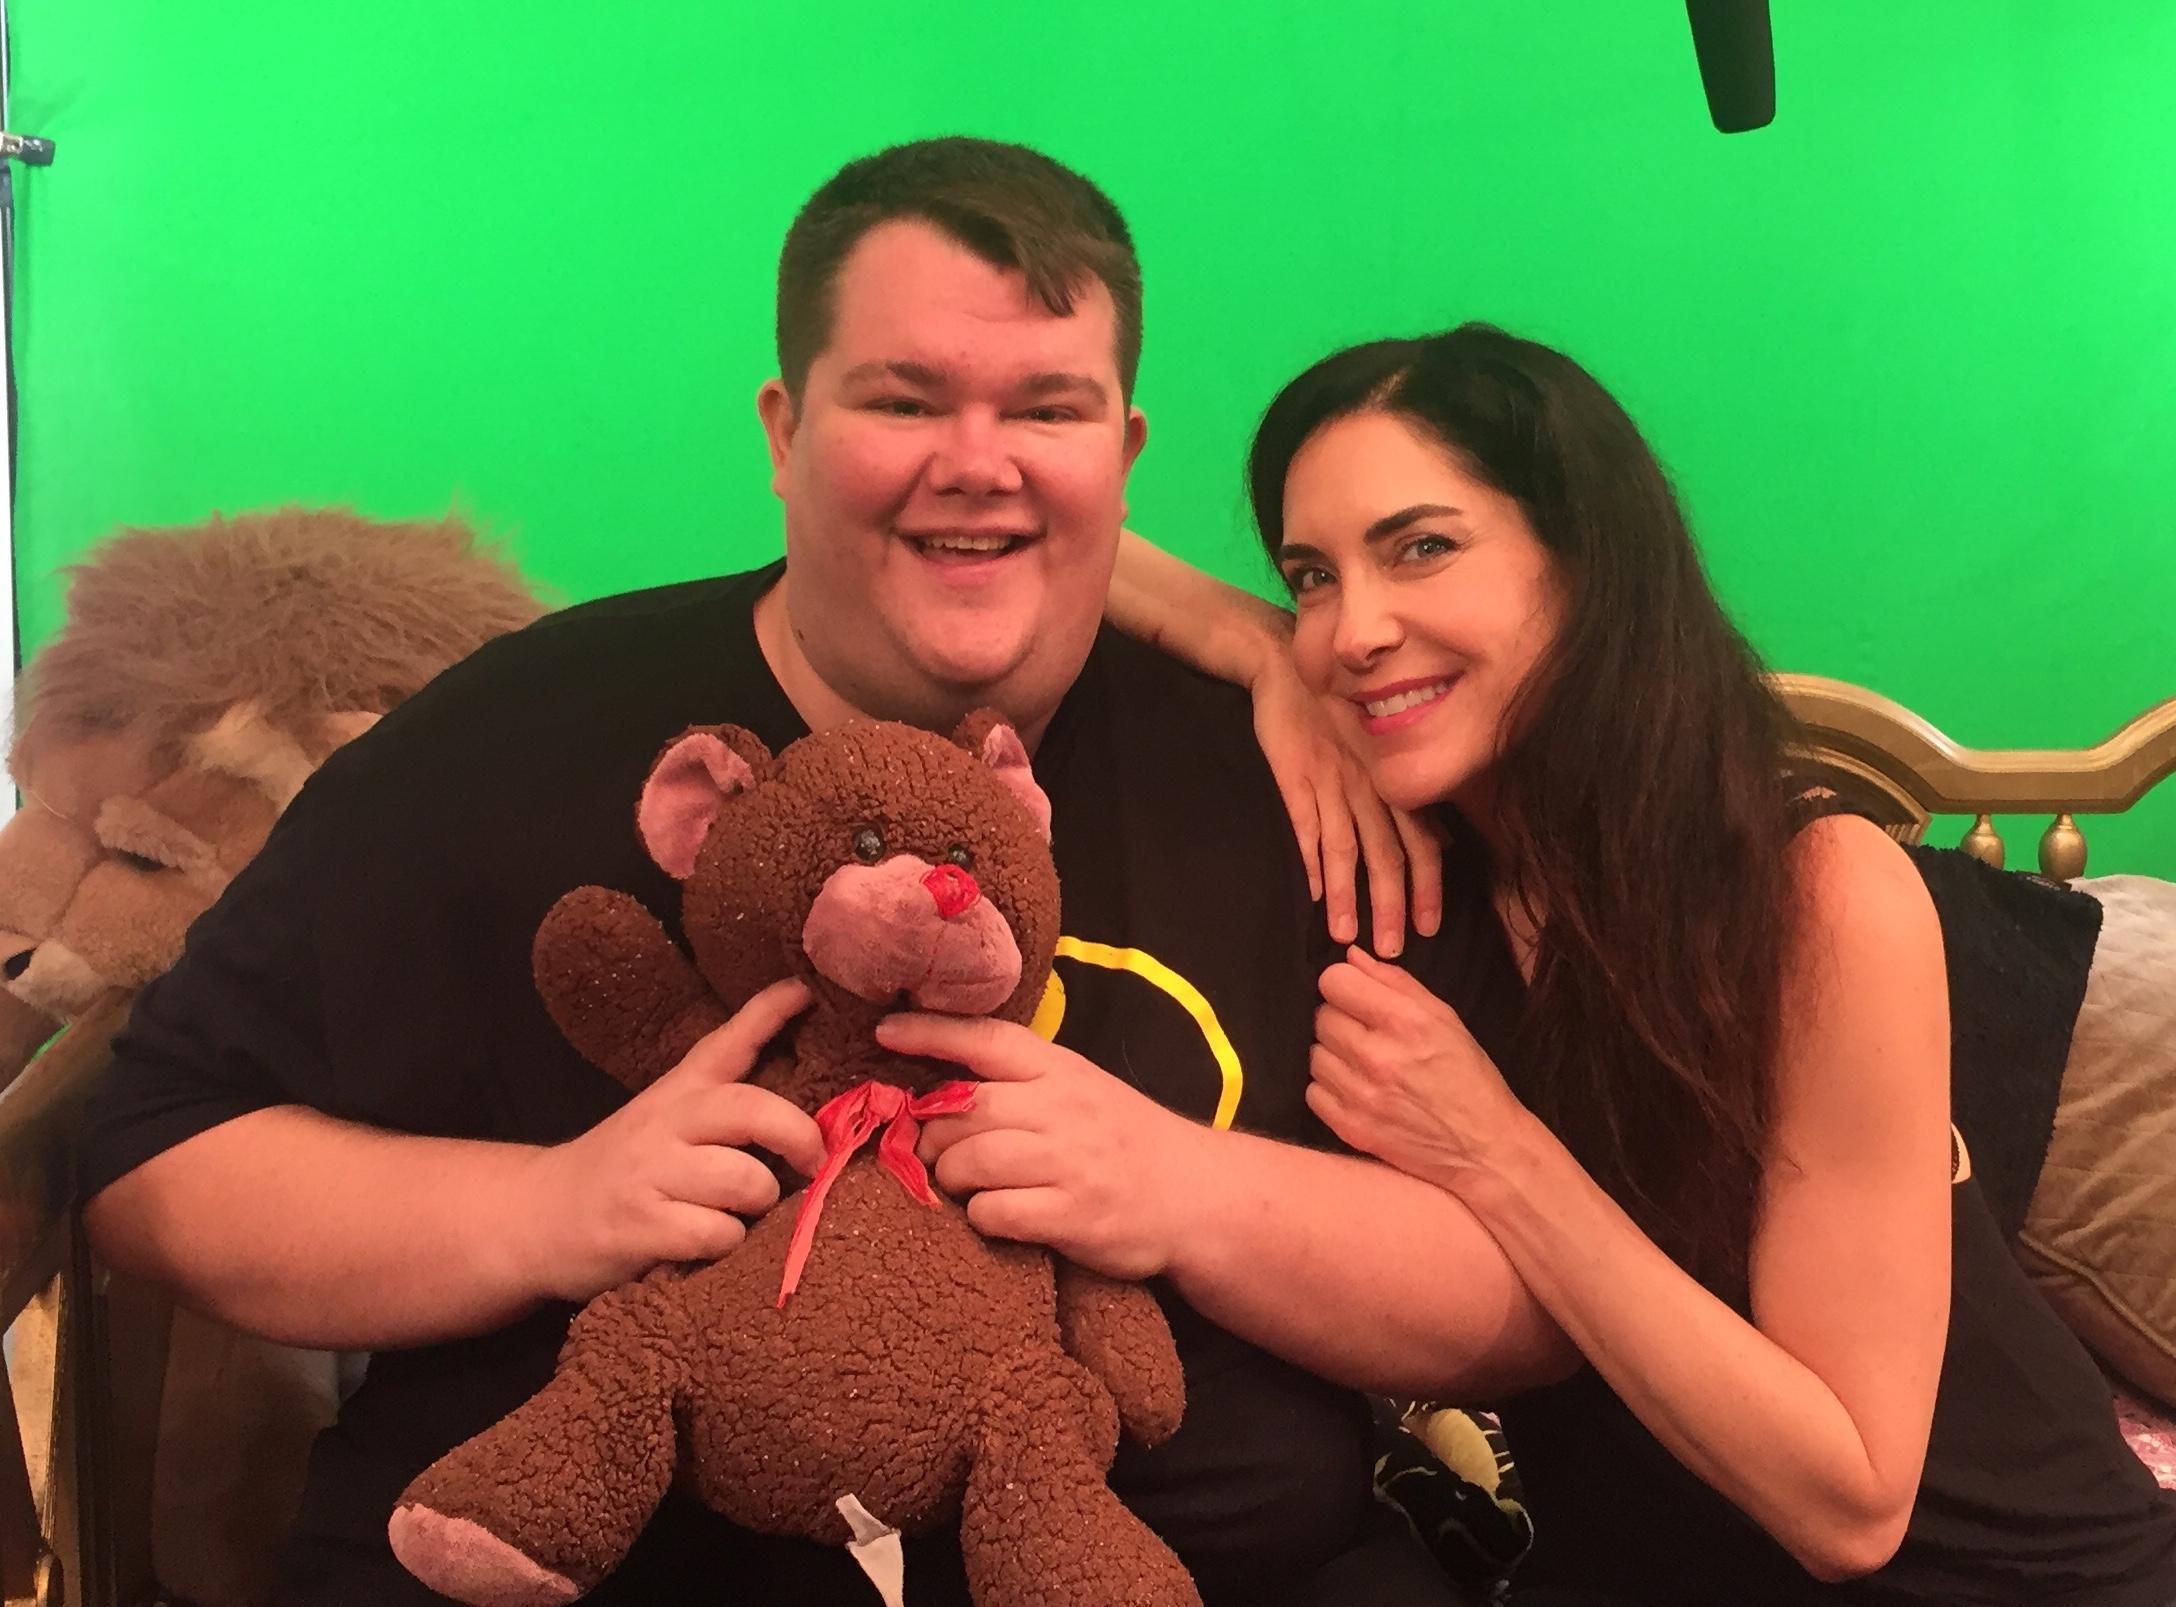 Chris Cope and the Rape Bear